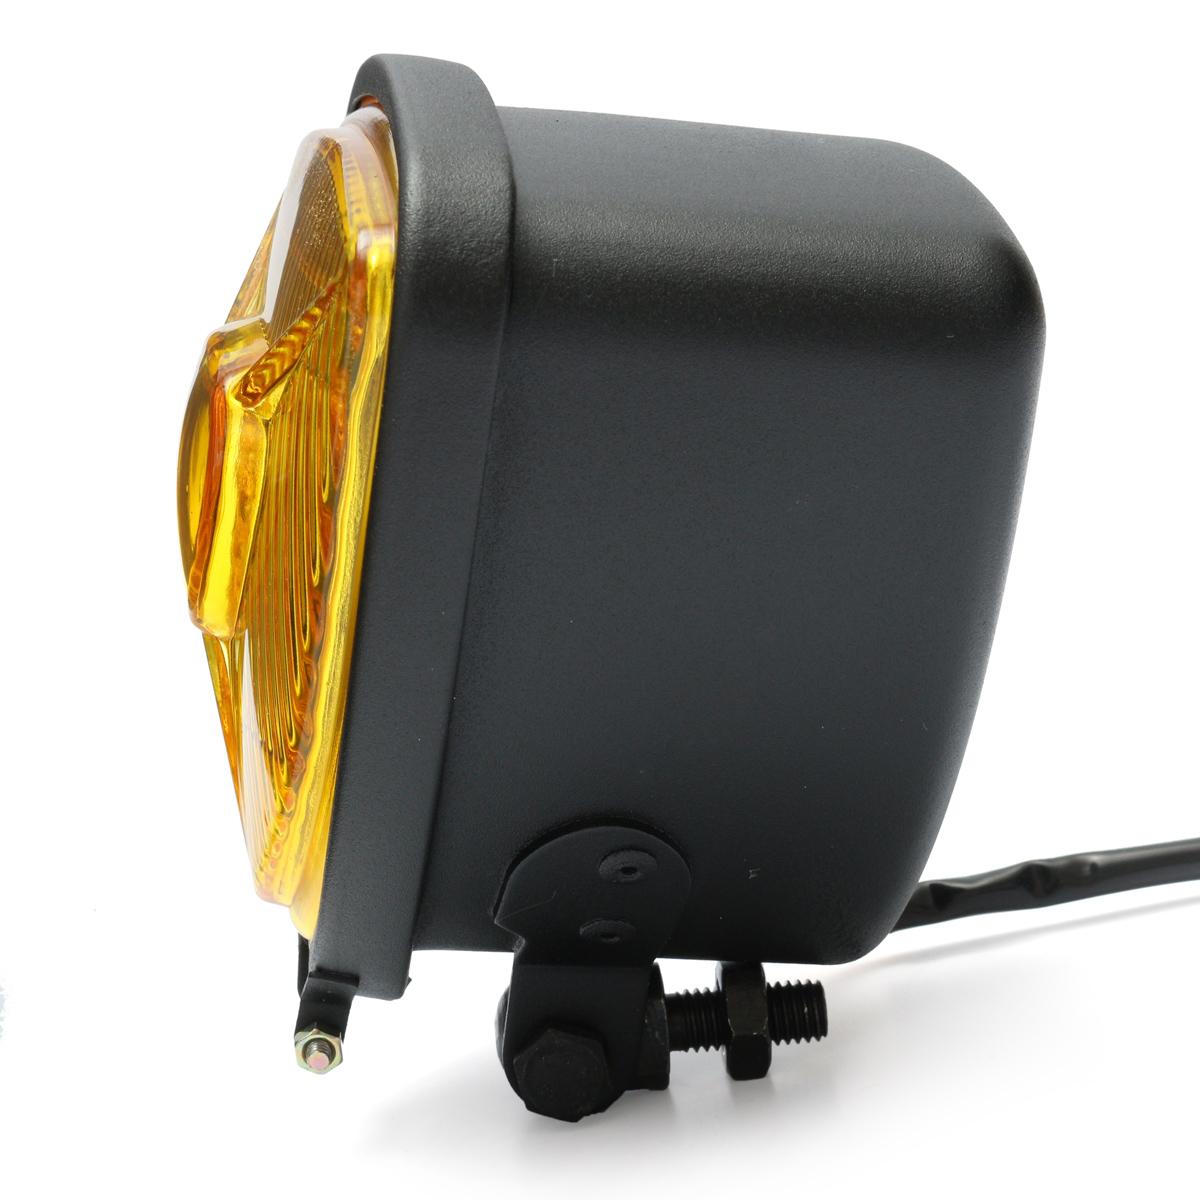 12V H4 35W Motorcycle Triangle Headlight Hi/Lo Beam For Harley Chopper